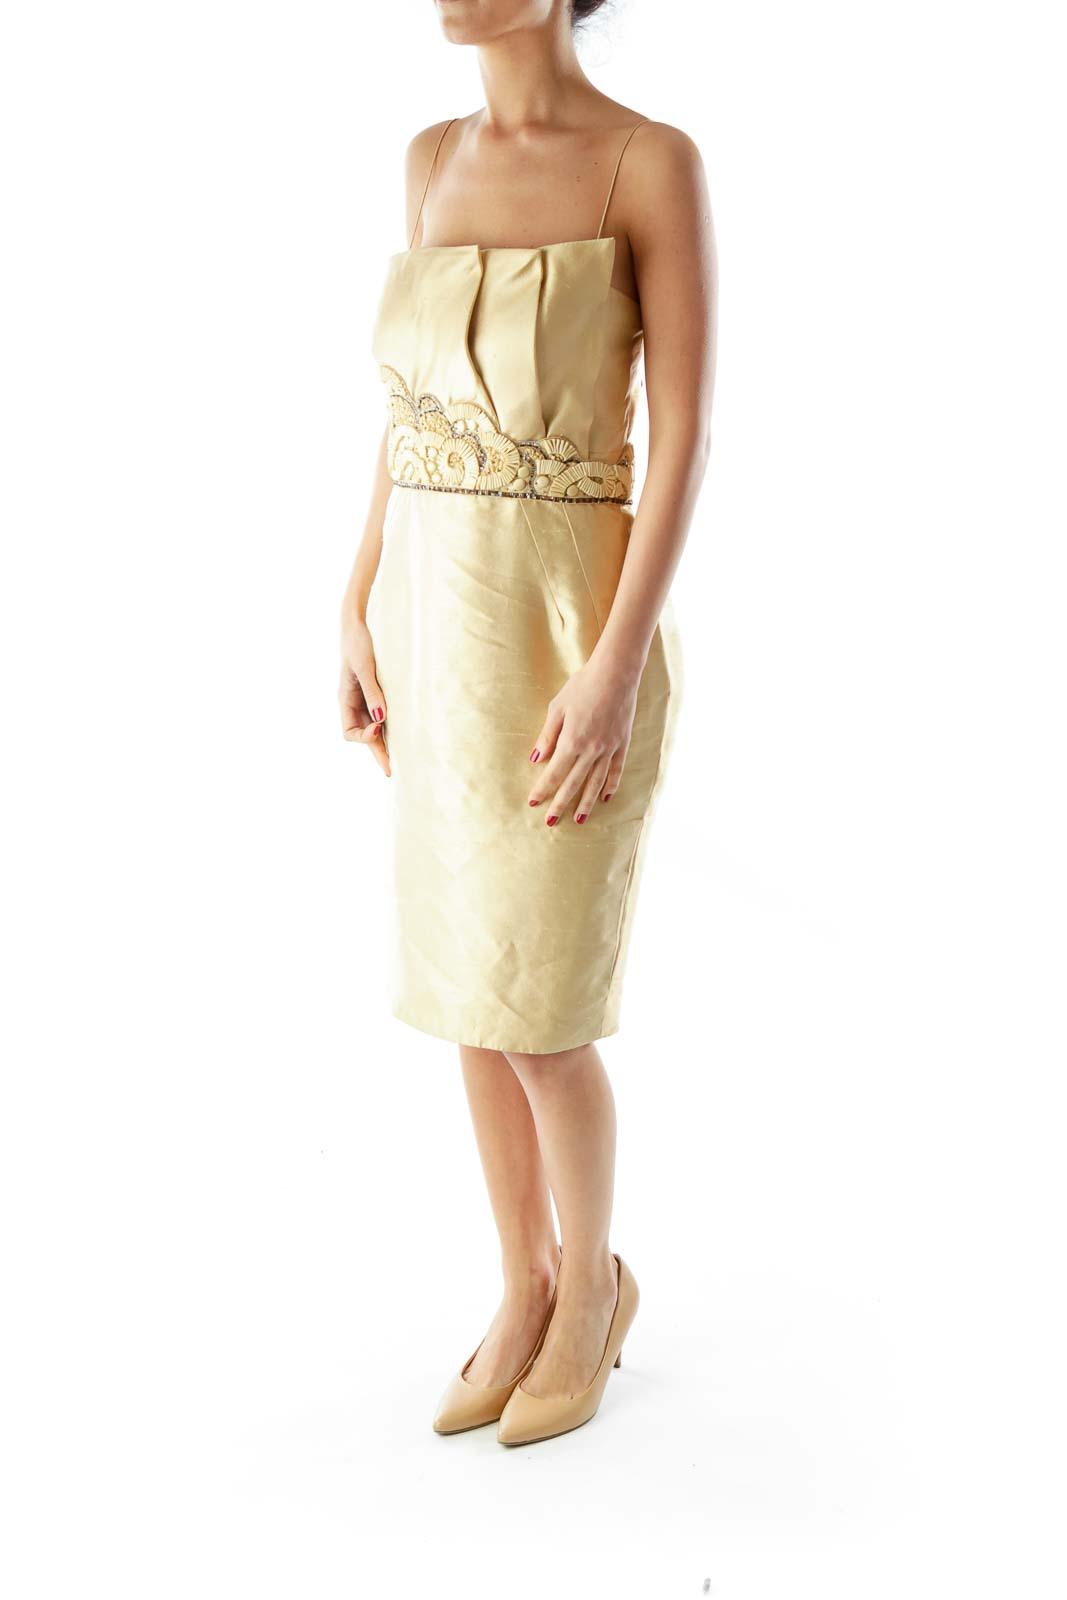 Gold Strapless Beaded Textured Dress